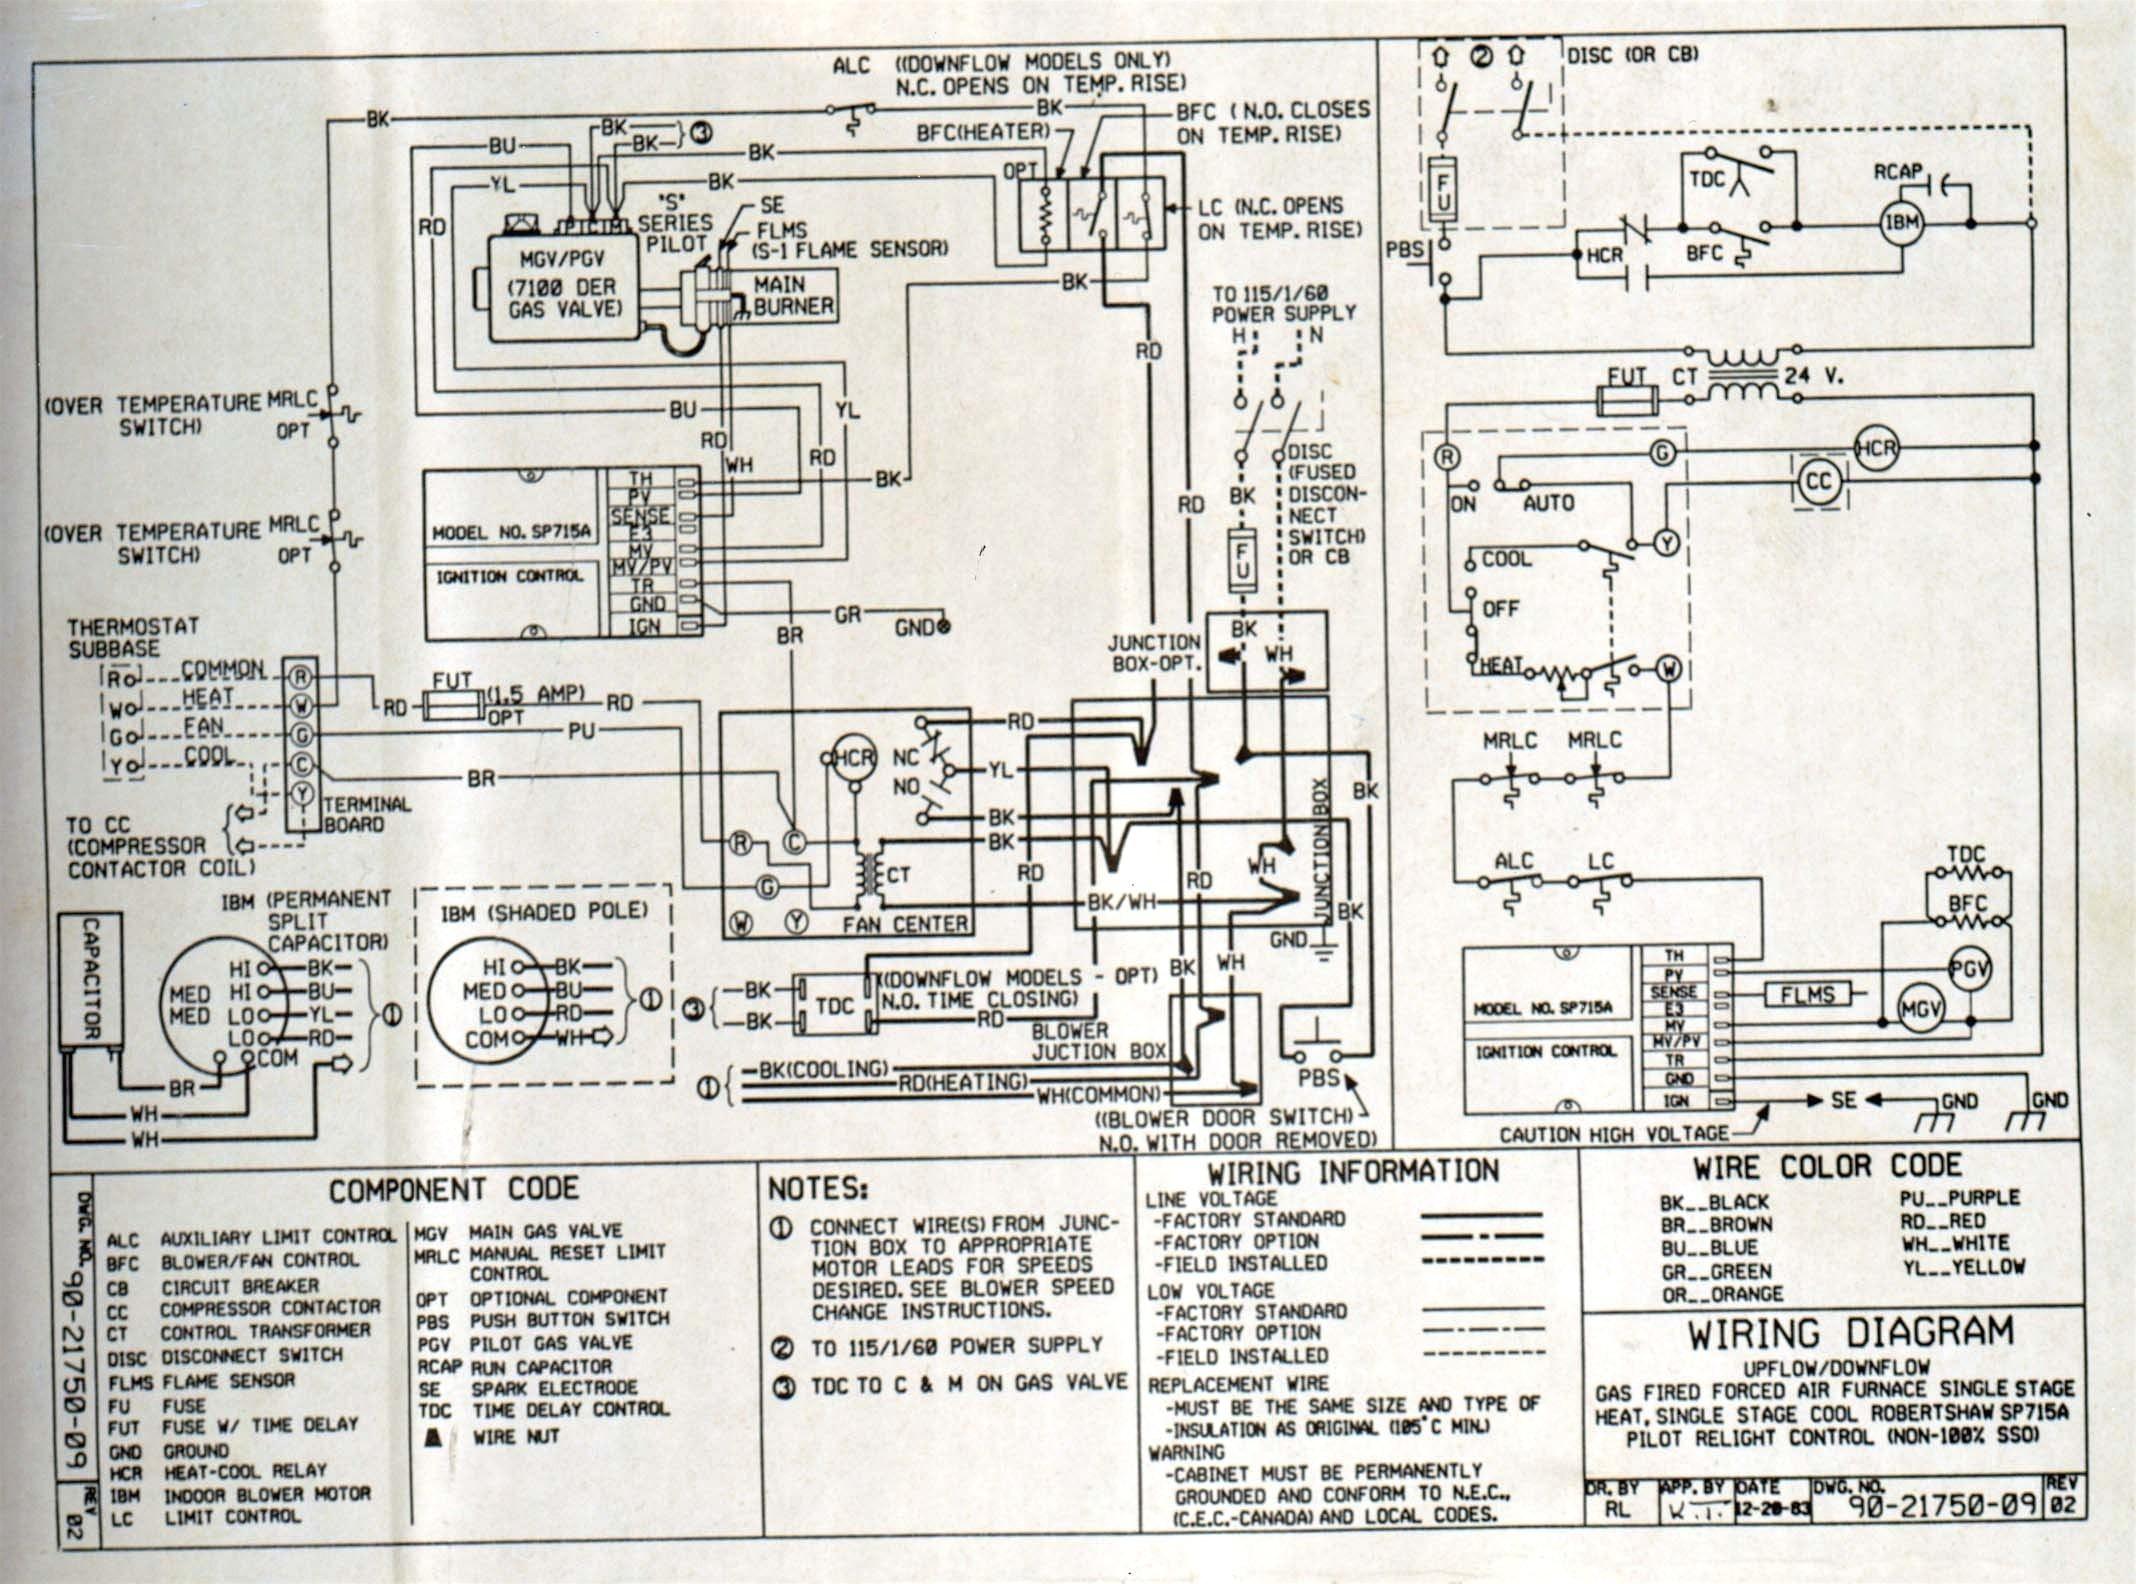 Honeywell Rth3100c thermostat Wiring Diagram Honeywell thermostat Relay Wiring Diagram Valid Wiring Diagram for A Of Honeywell Rth3100c thermostat Wiring Diagram